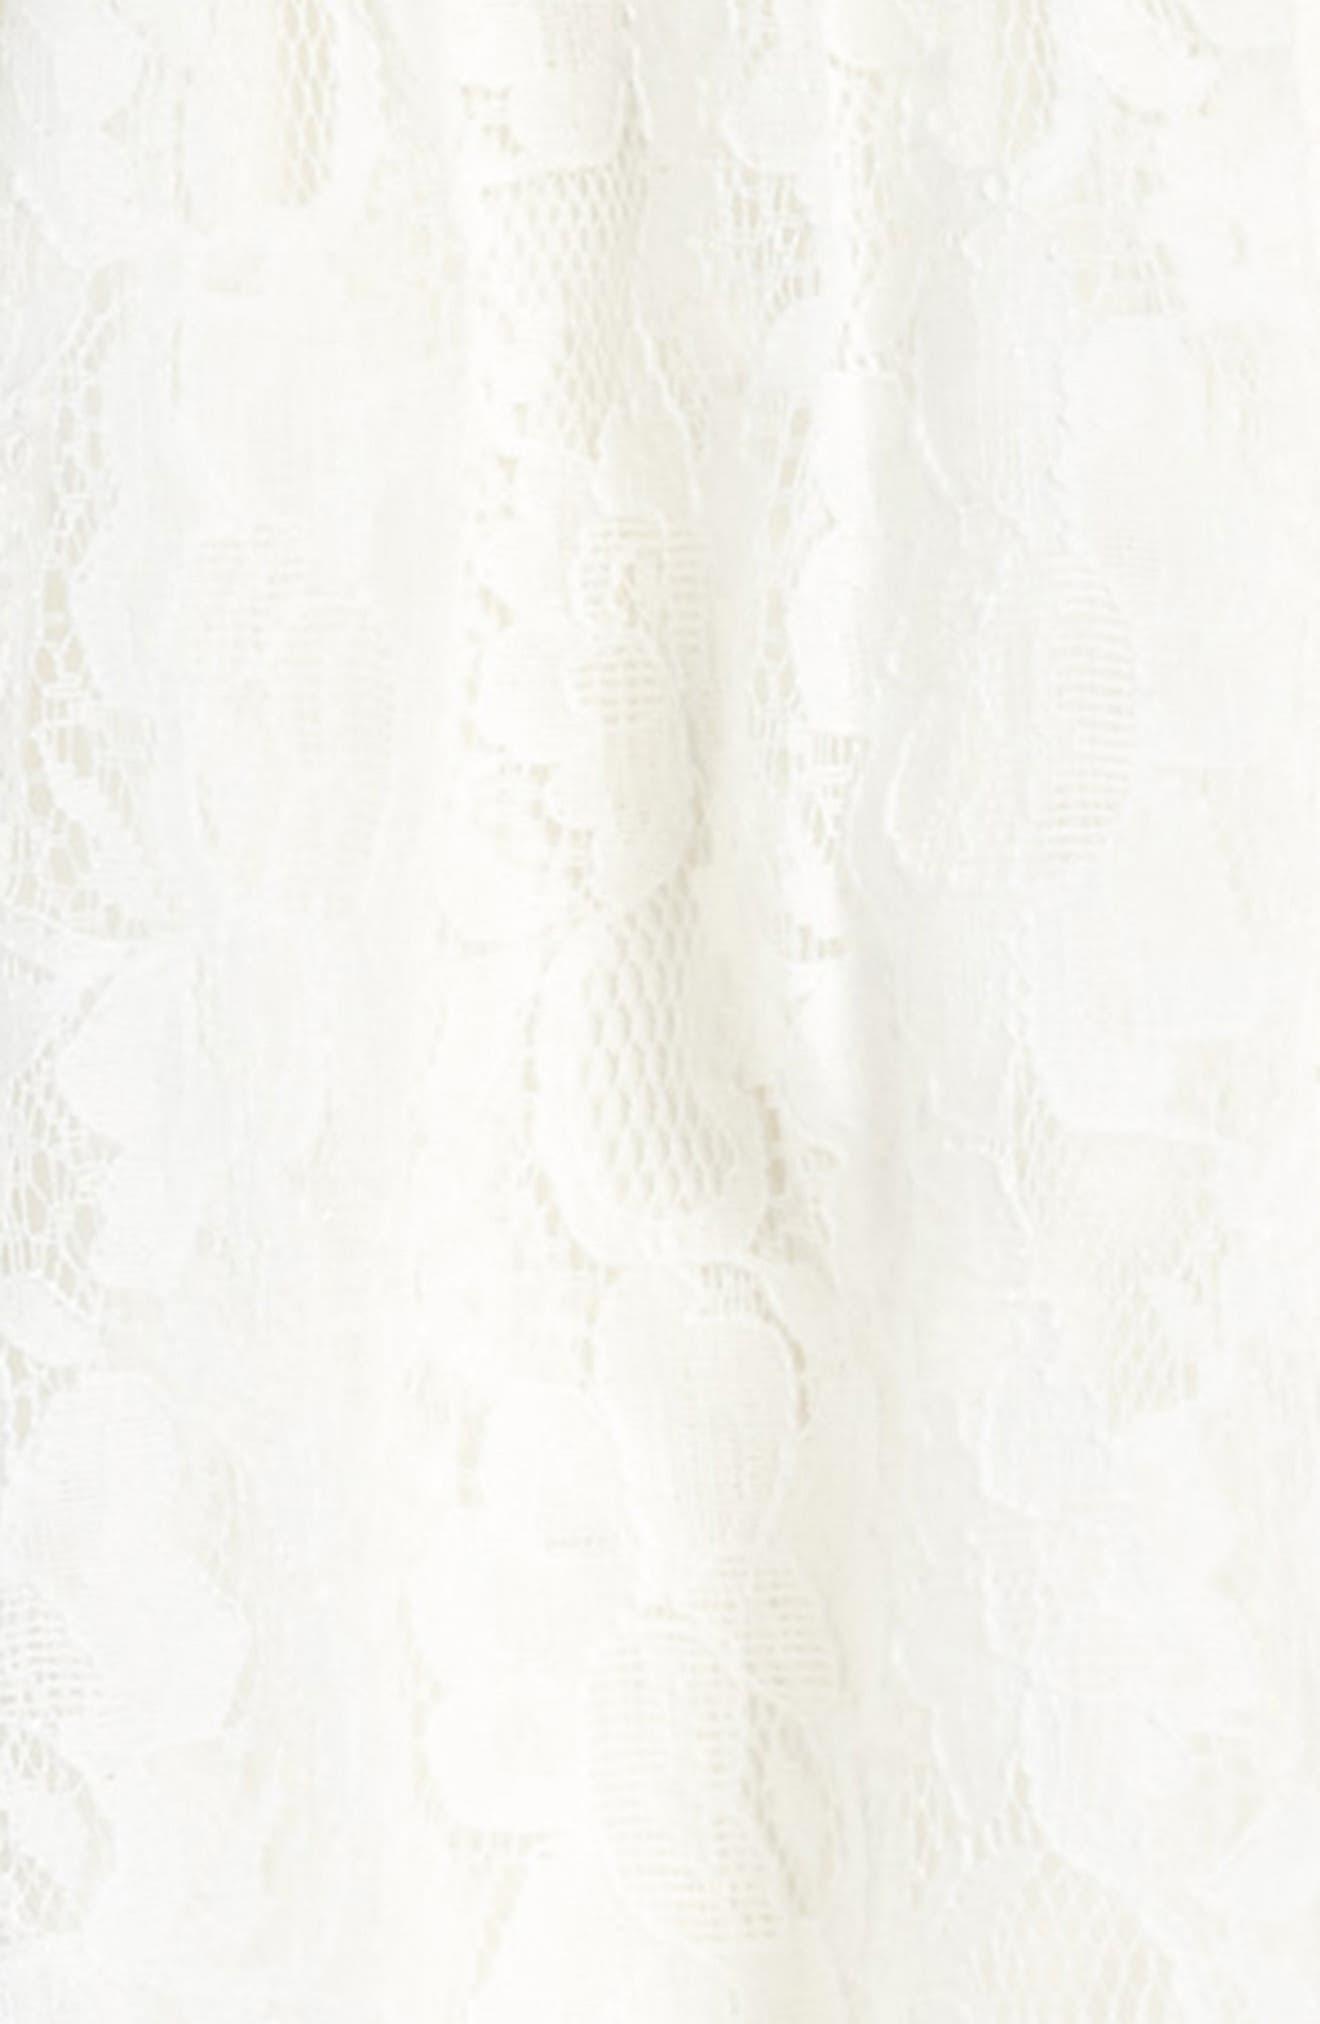 Lyla Lace Dress,                             Alternate thumbnail 3, color,                             900